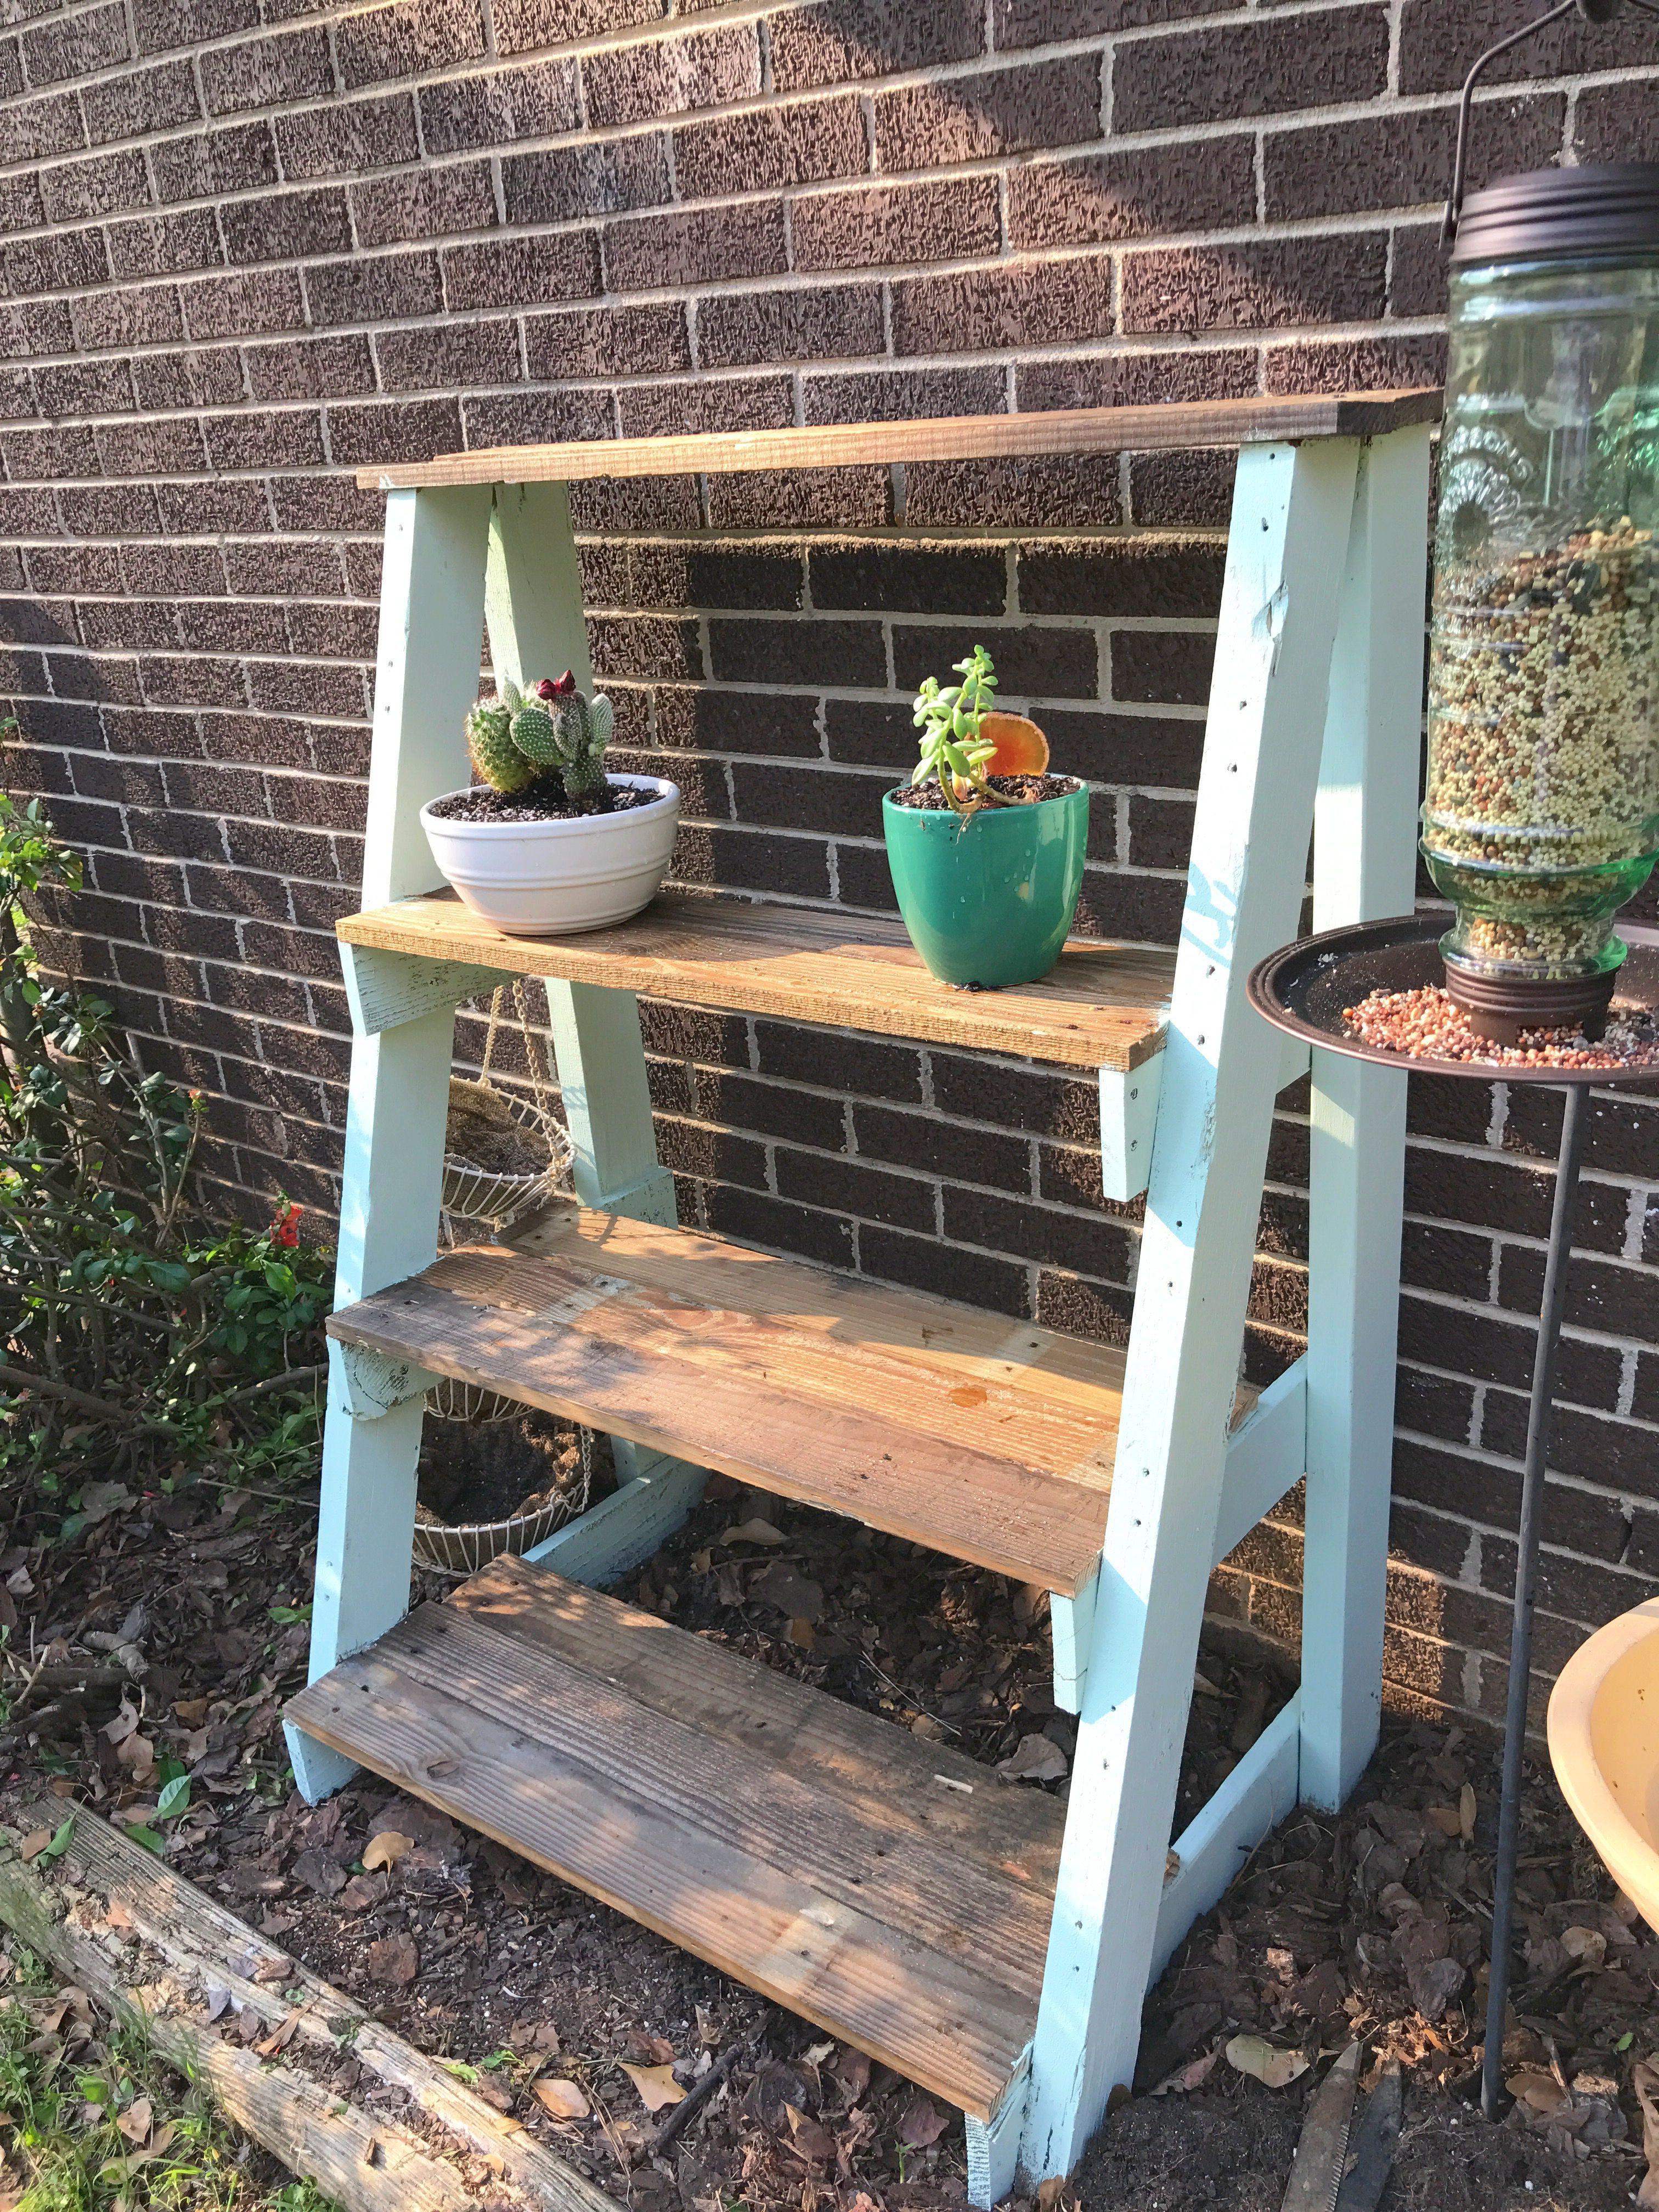 diy plant stand ideas diy and crafts garden shelves pallets garden diy pallet projects. Black Bedroom Furniture Sets. Home Design Ideas